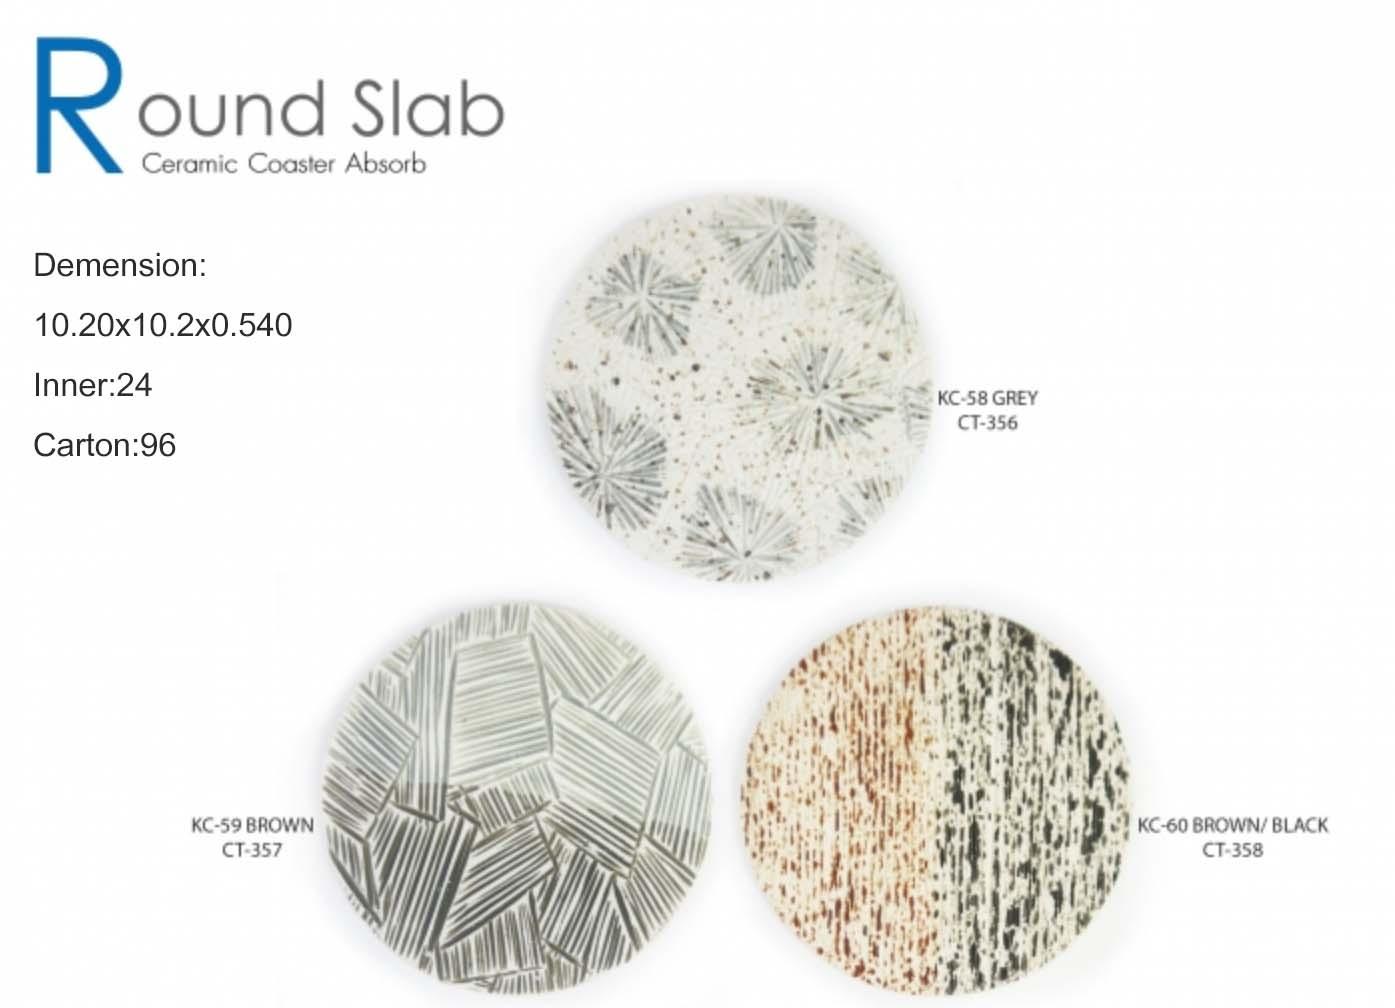 PS-RoundSlap-CeramicCoasterAbsorb2